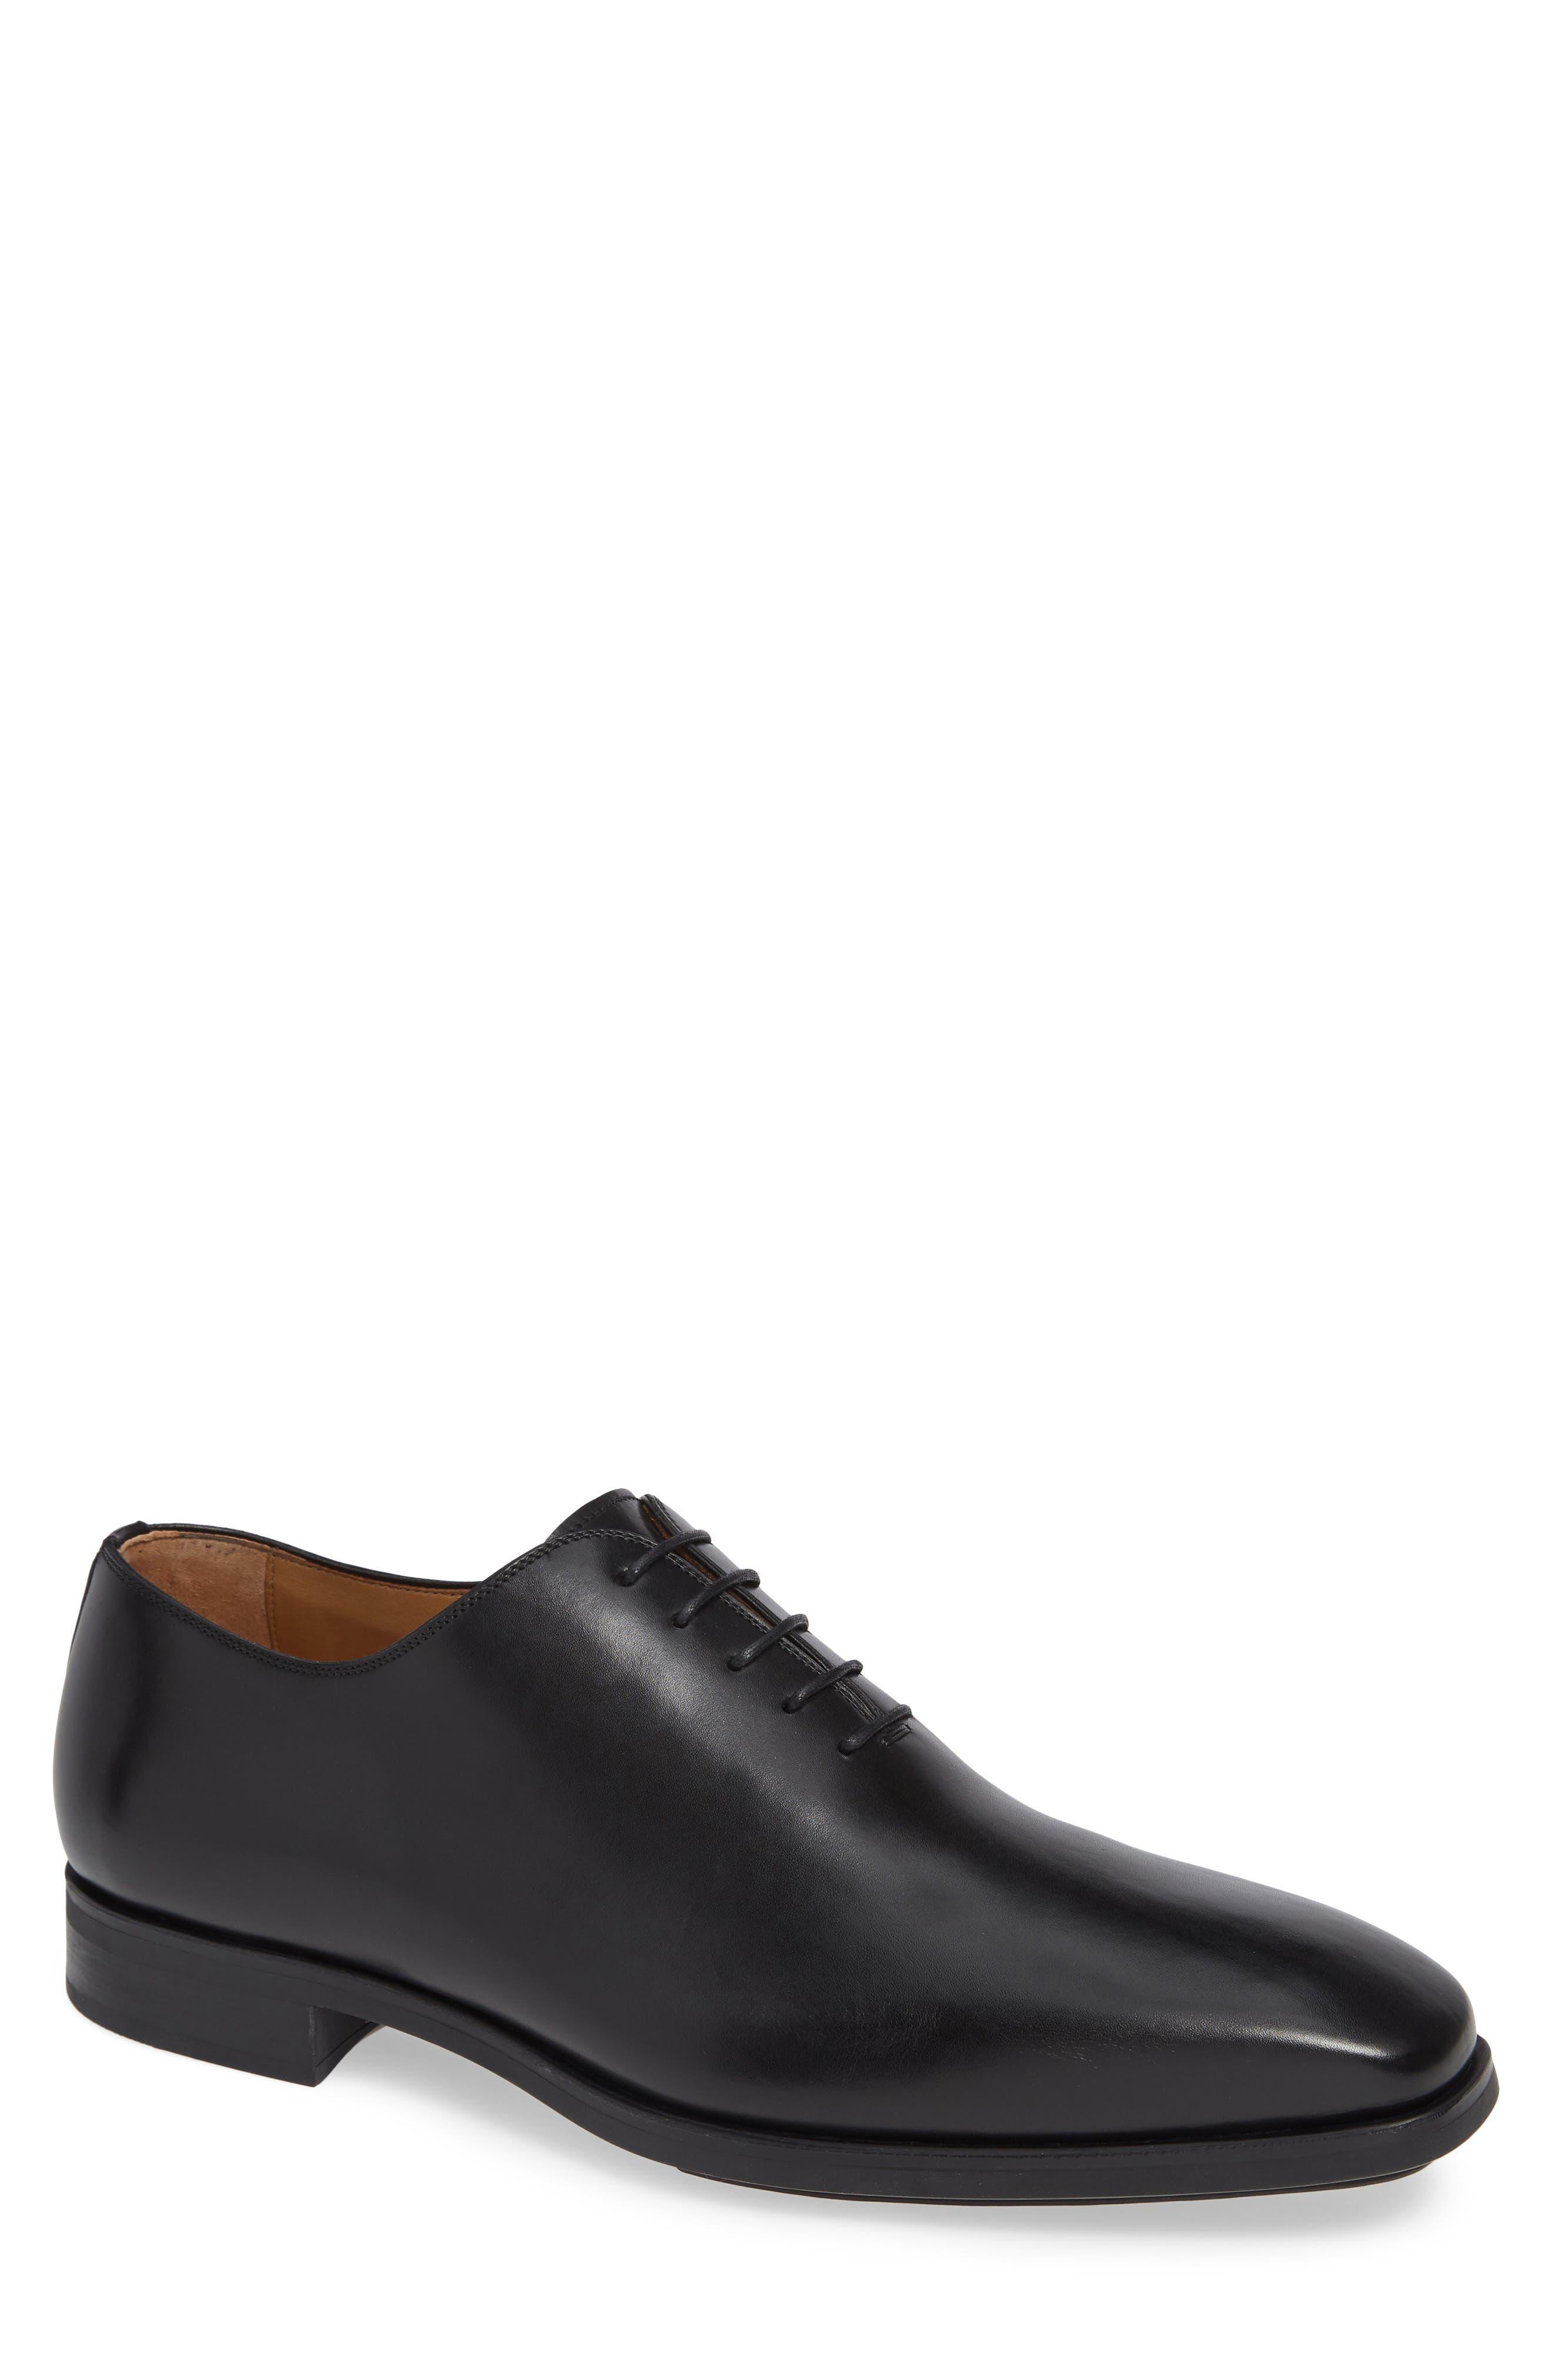 Ryder Plain Toe Oxford,                         Main,                         color, BLACK LEATHER